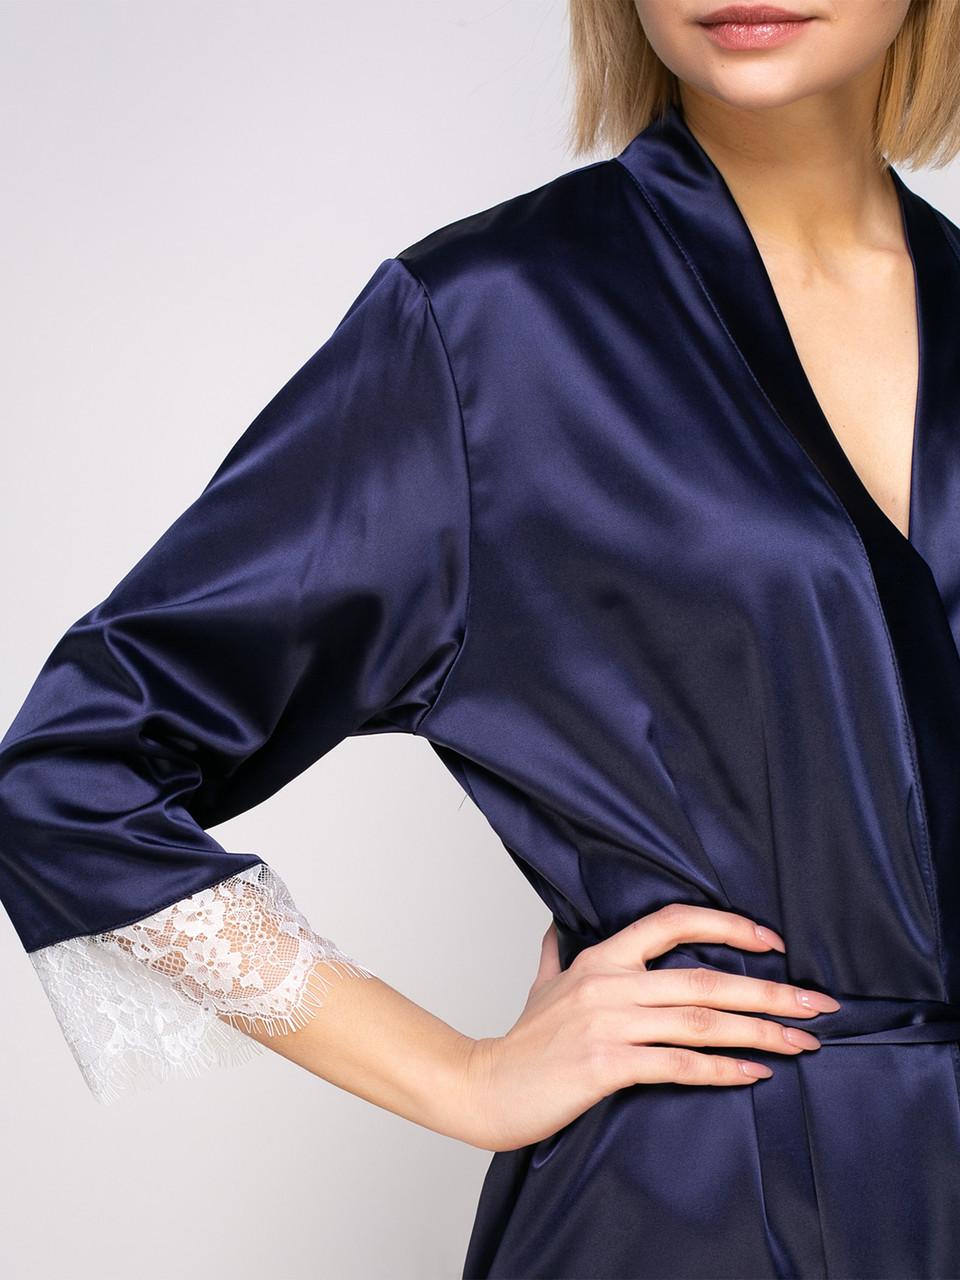 Халат Serenade сатин-шёлк синий с шампаневым кружевом 3